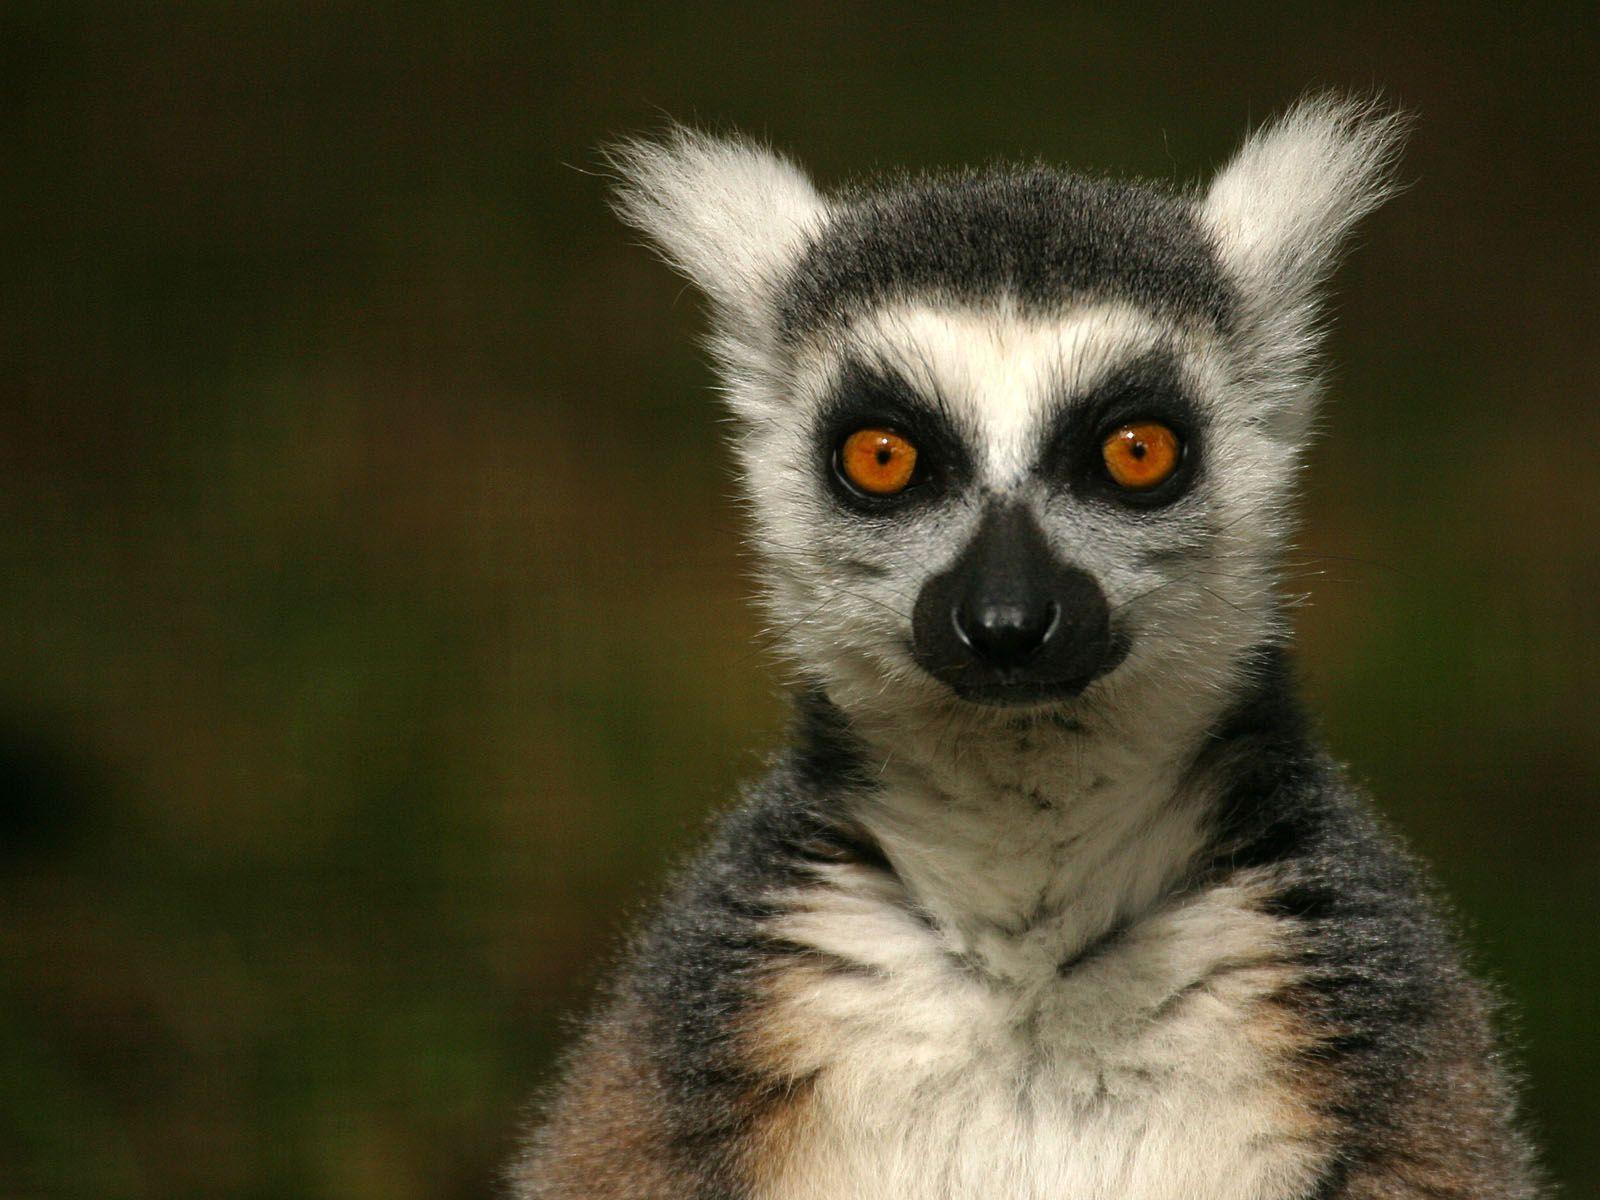 Good Lemur Wallpaper - fBqXerS  You Should Have_5715.jpg